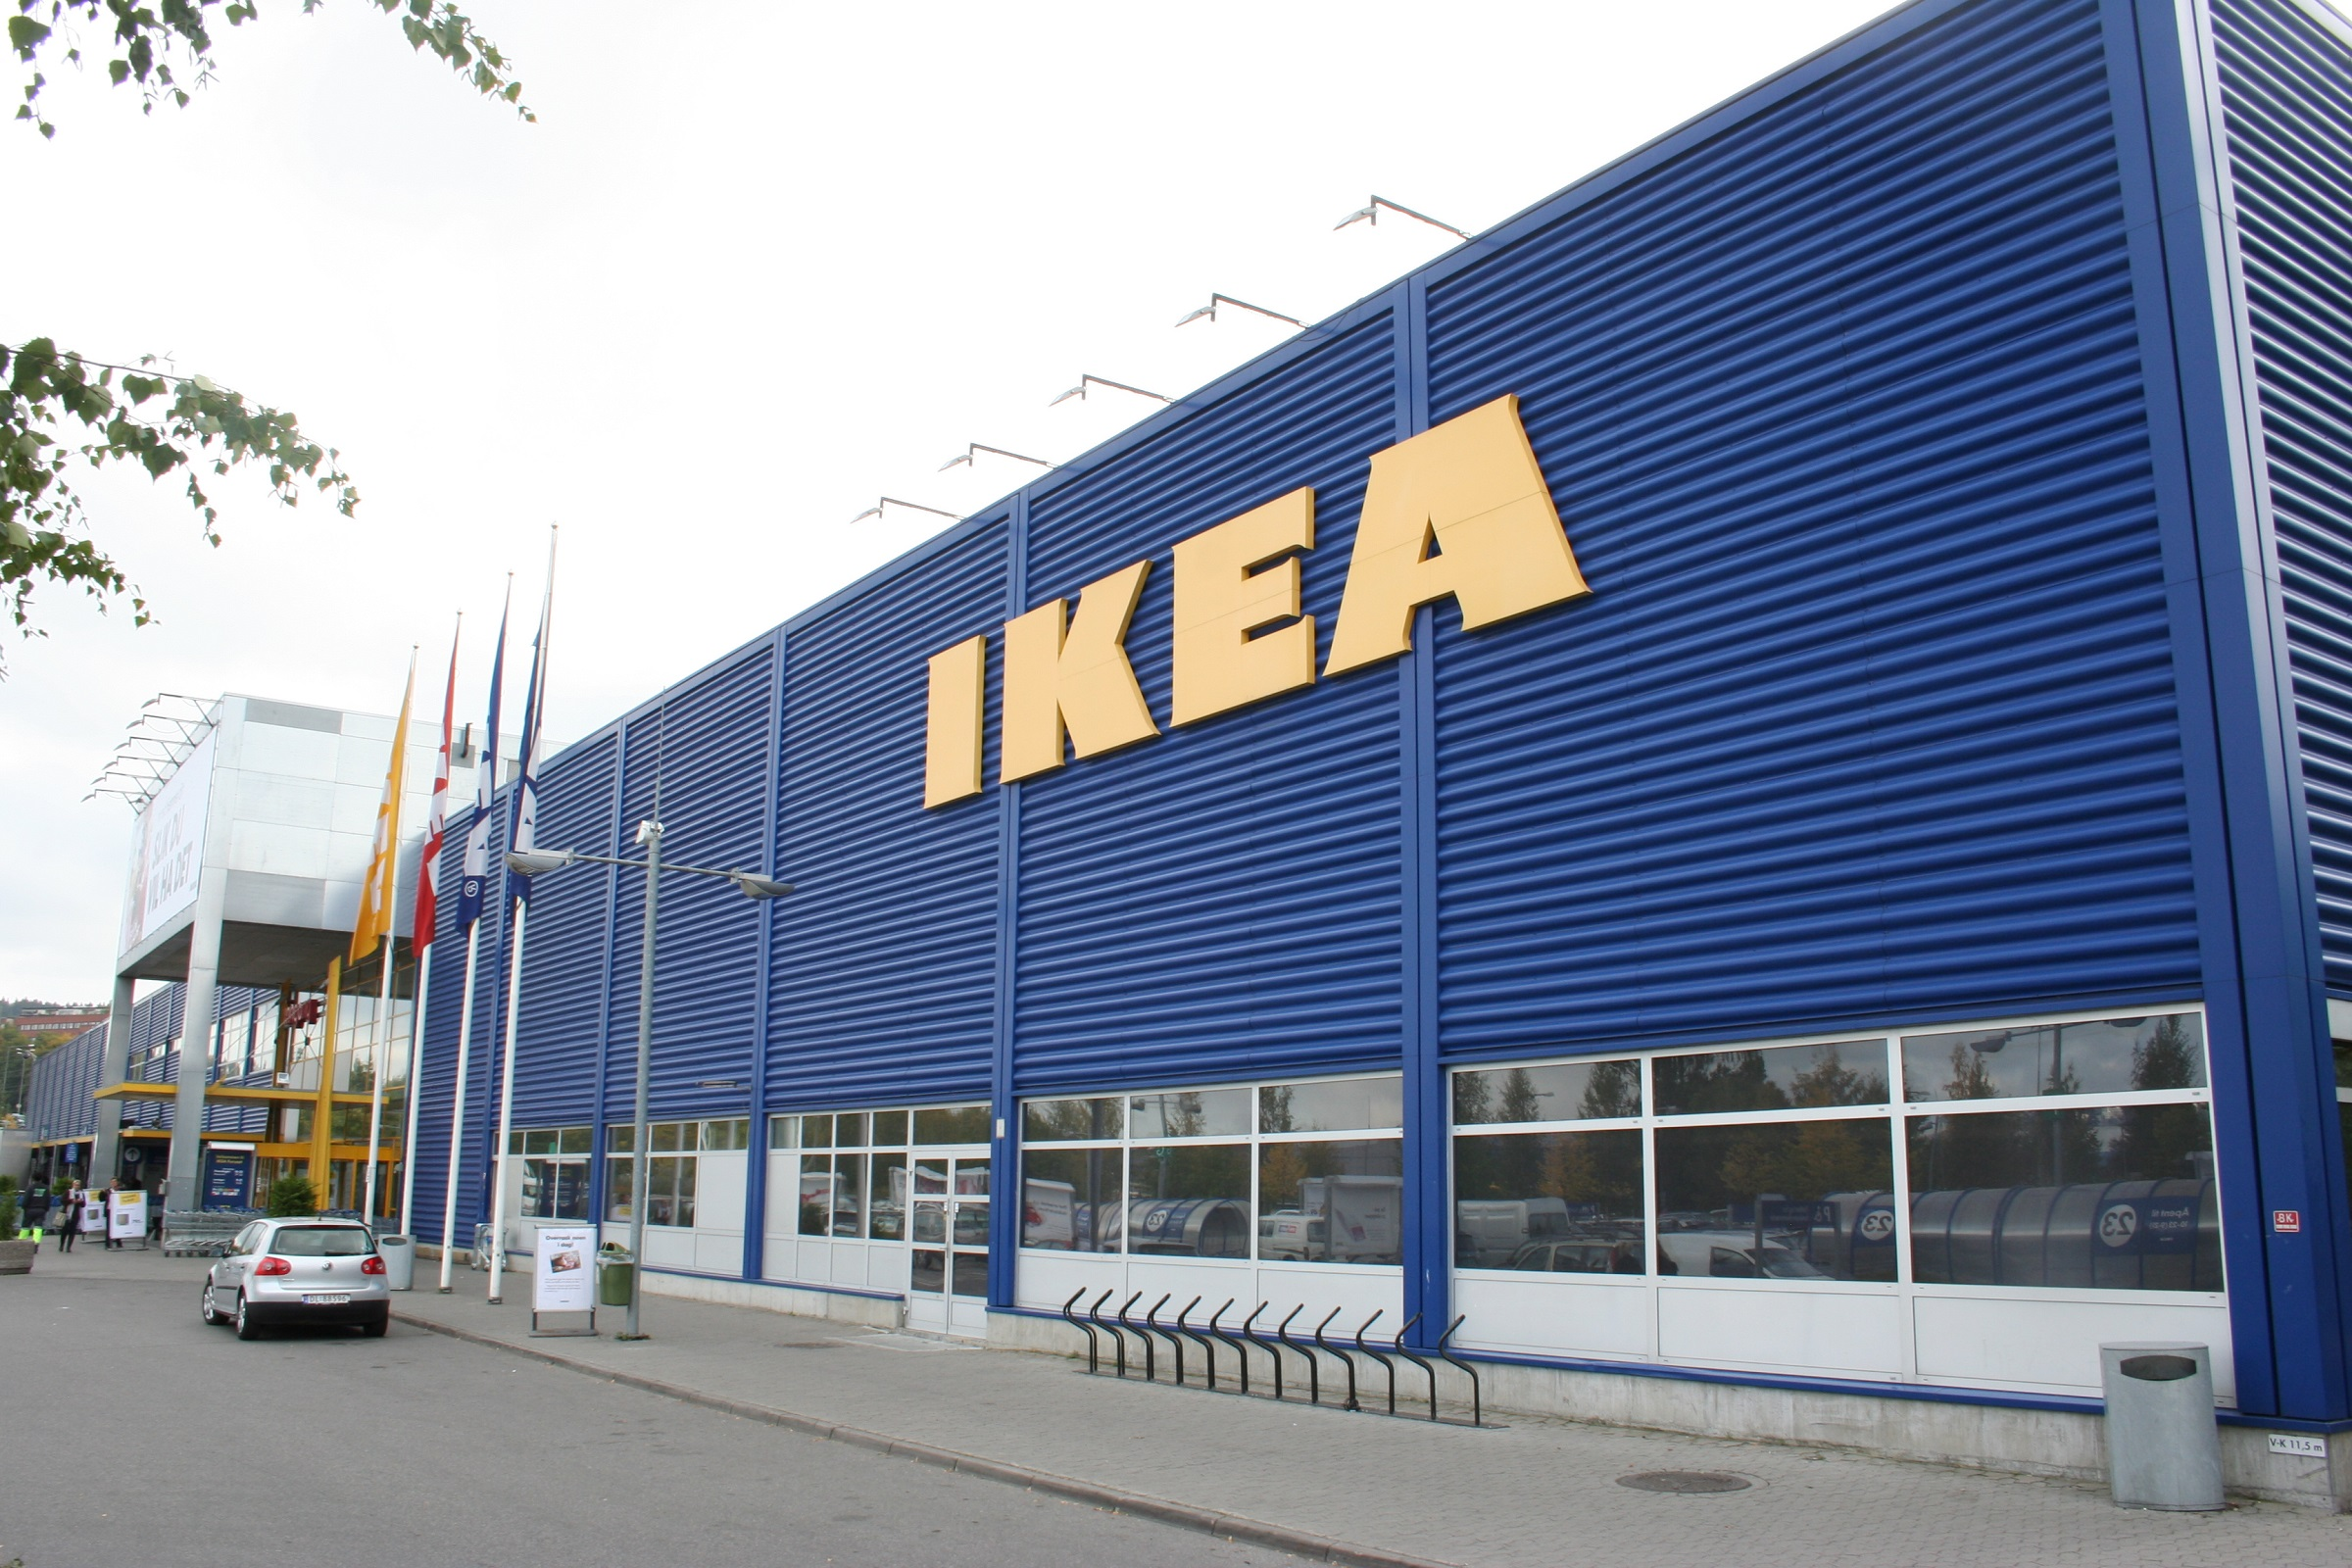 ikea oslo kart IKEA Furuset ikea oslo kart